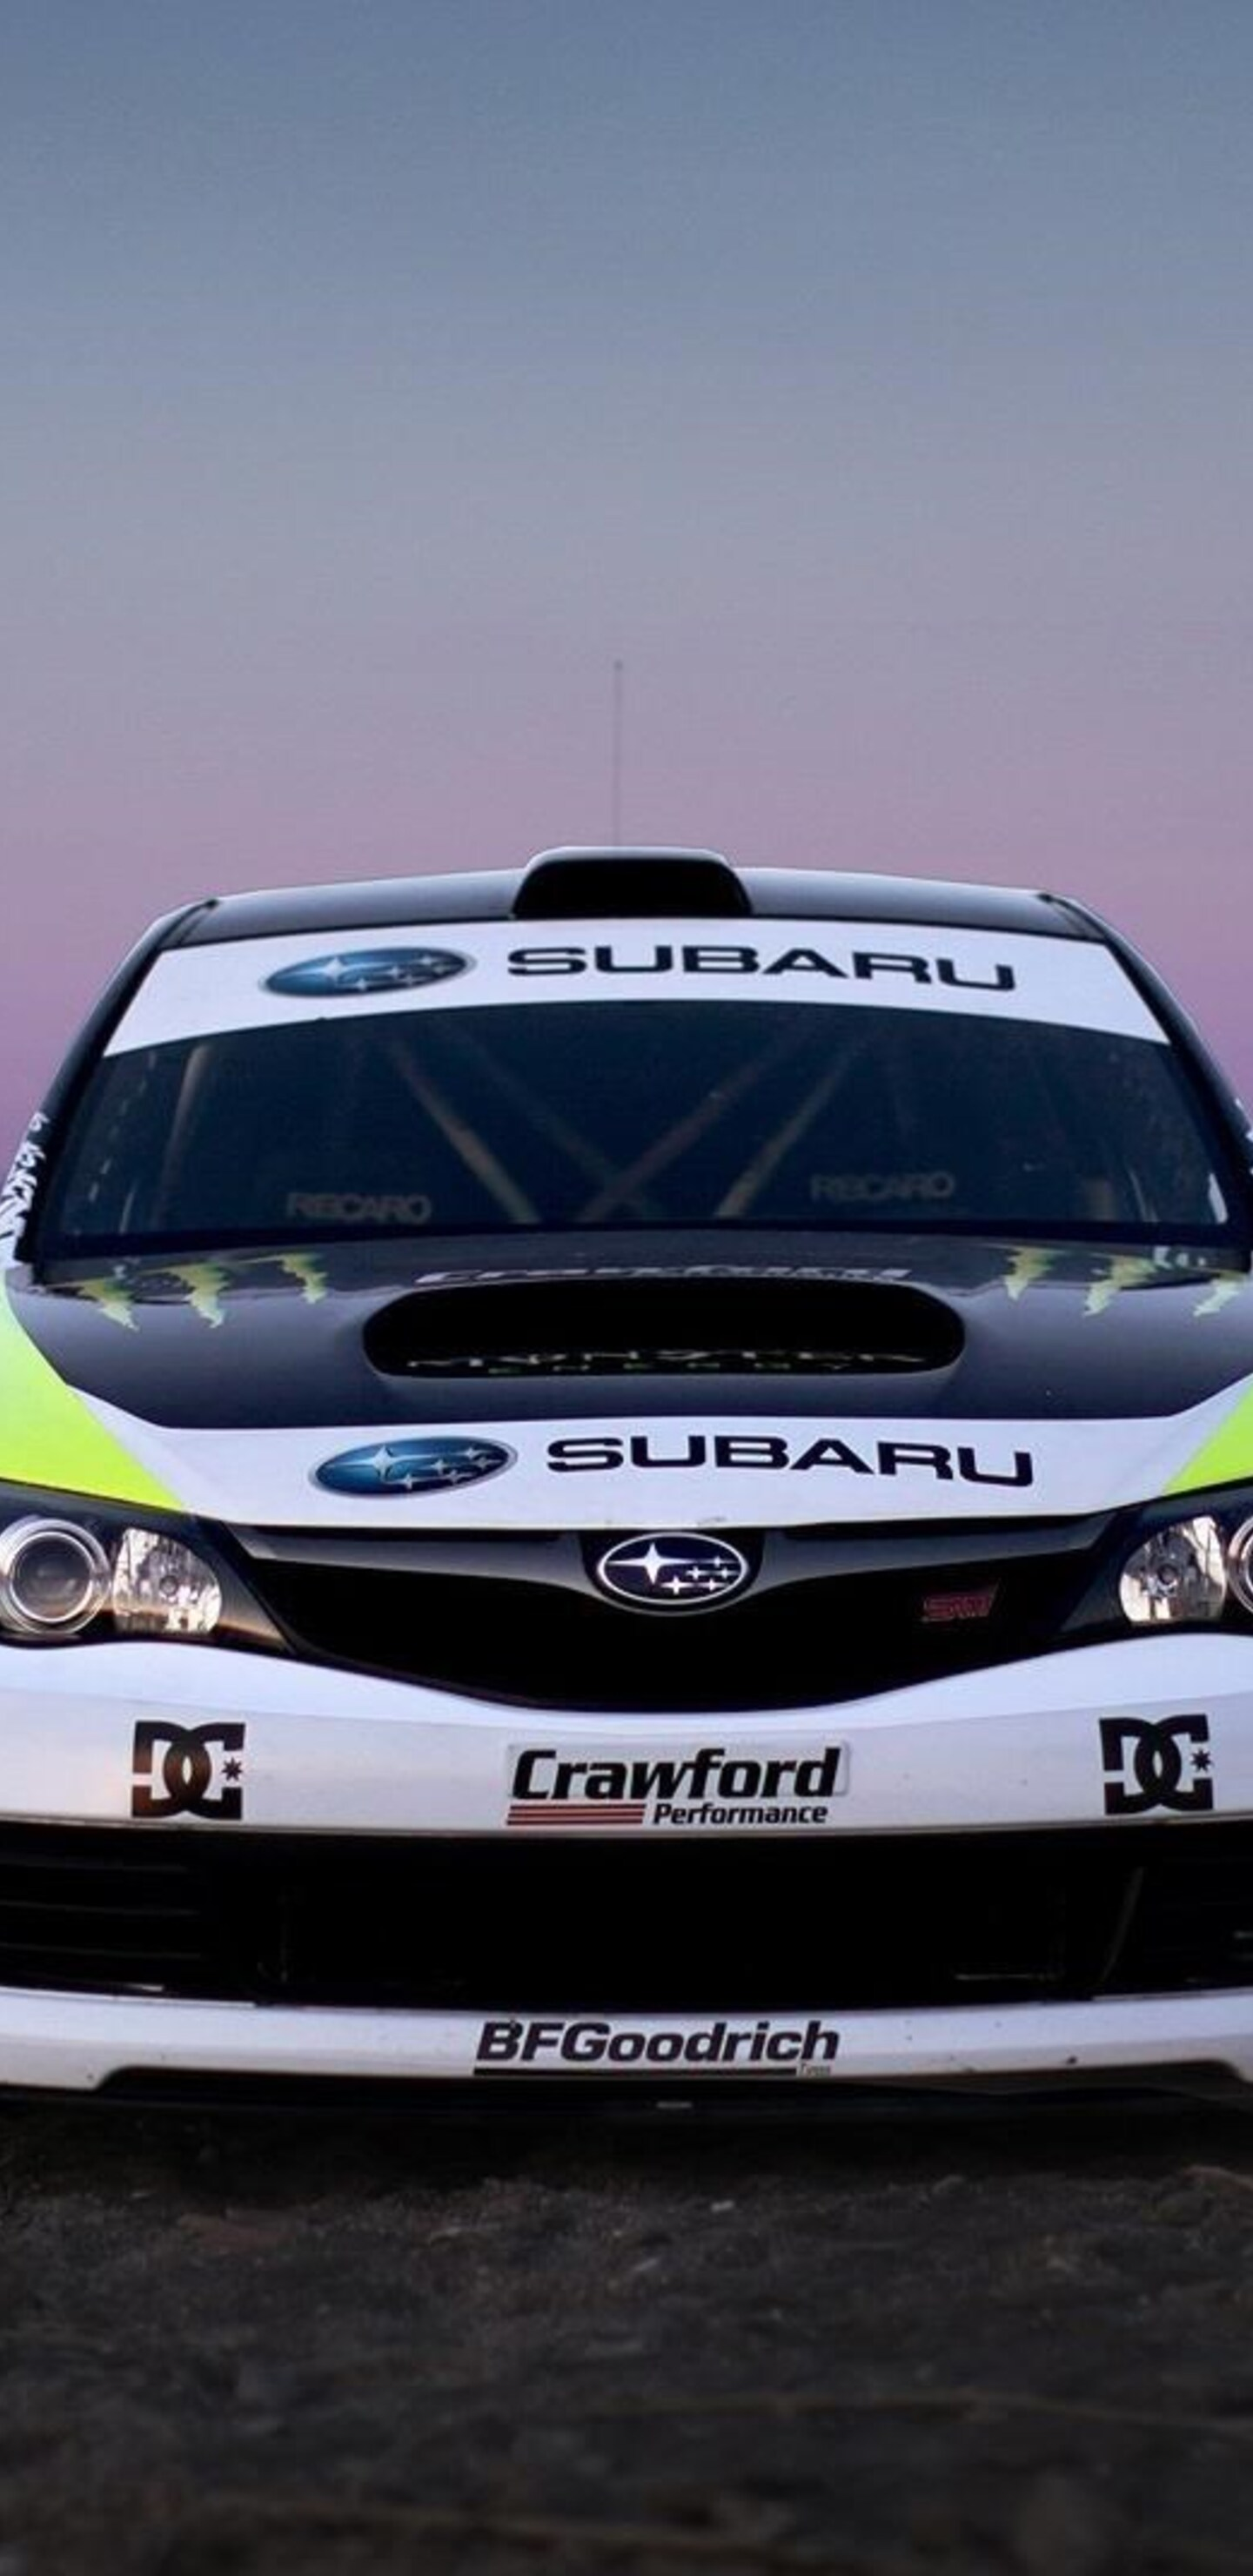 Subaru Mobile Wallpaper Automotive Wallpapers